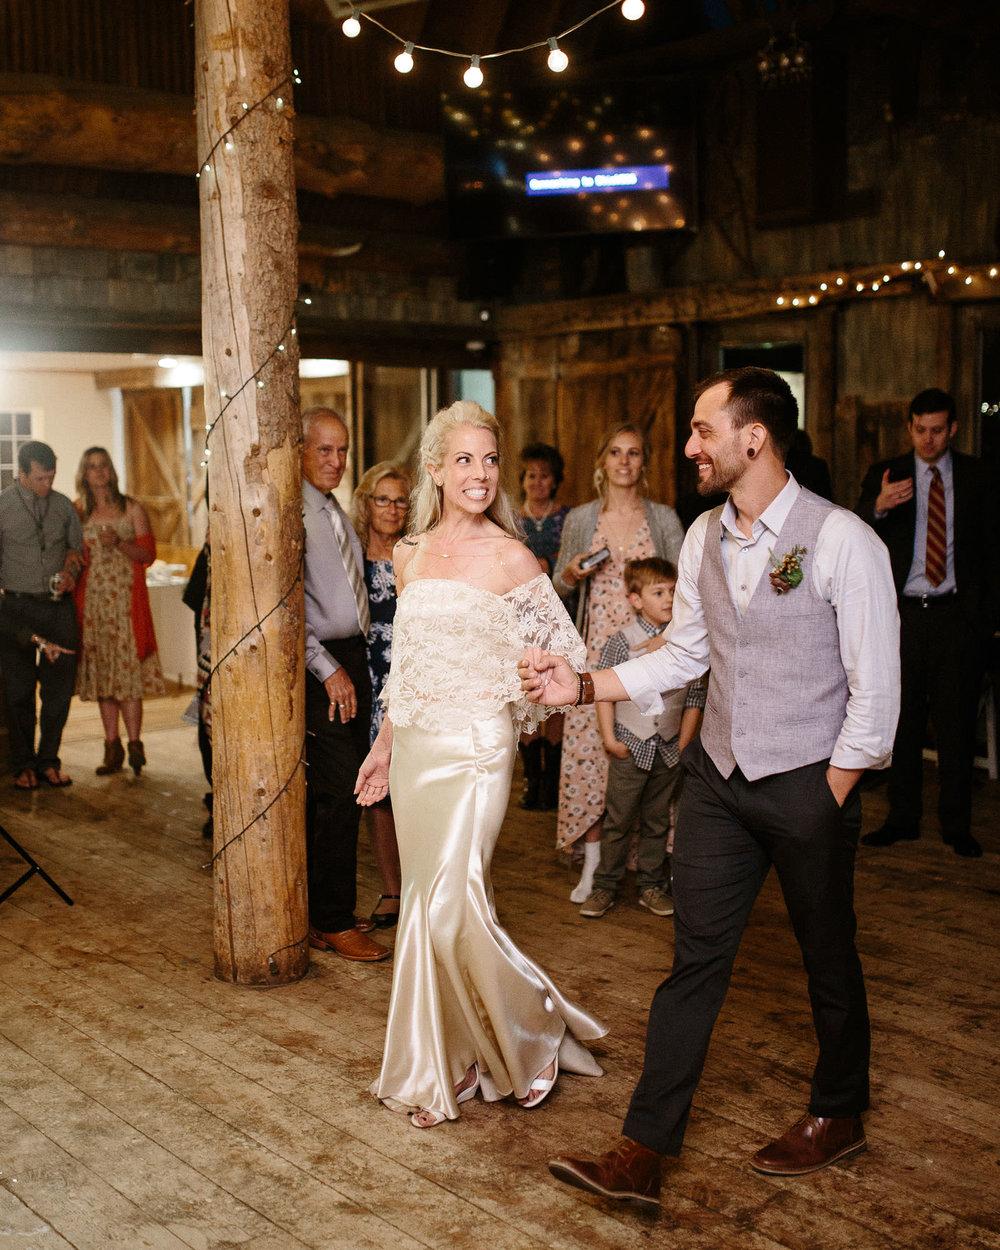 bucci-barn-wedding-elopement-evergreen-boulder-denver-colorado-adventerous-romantic-timeless-106.jpg